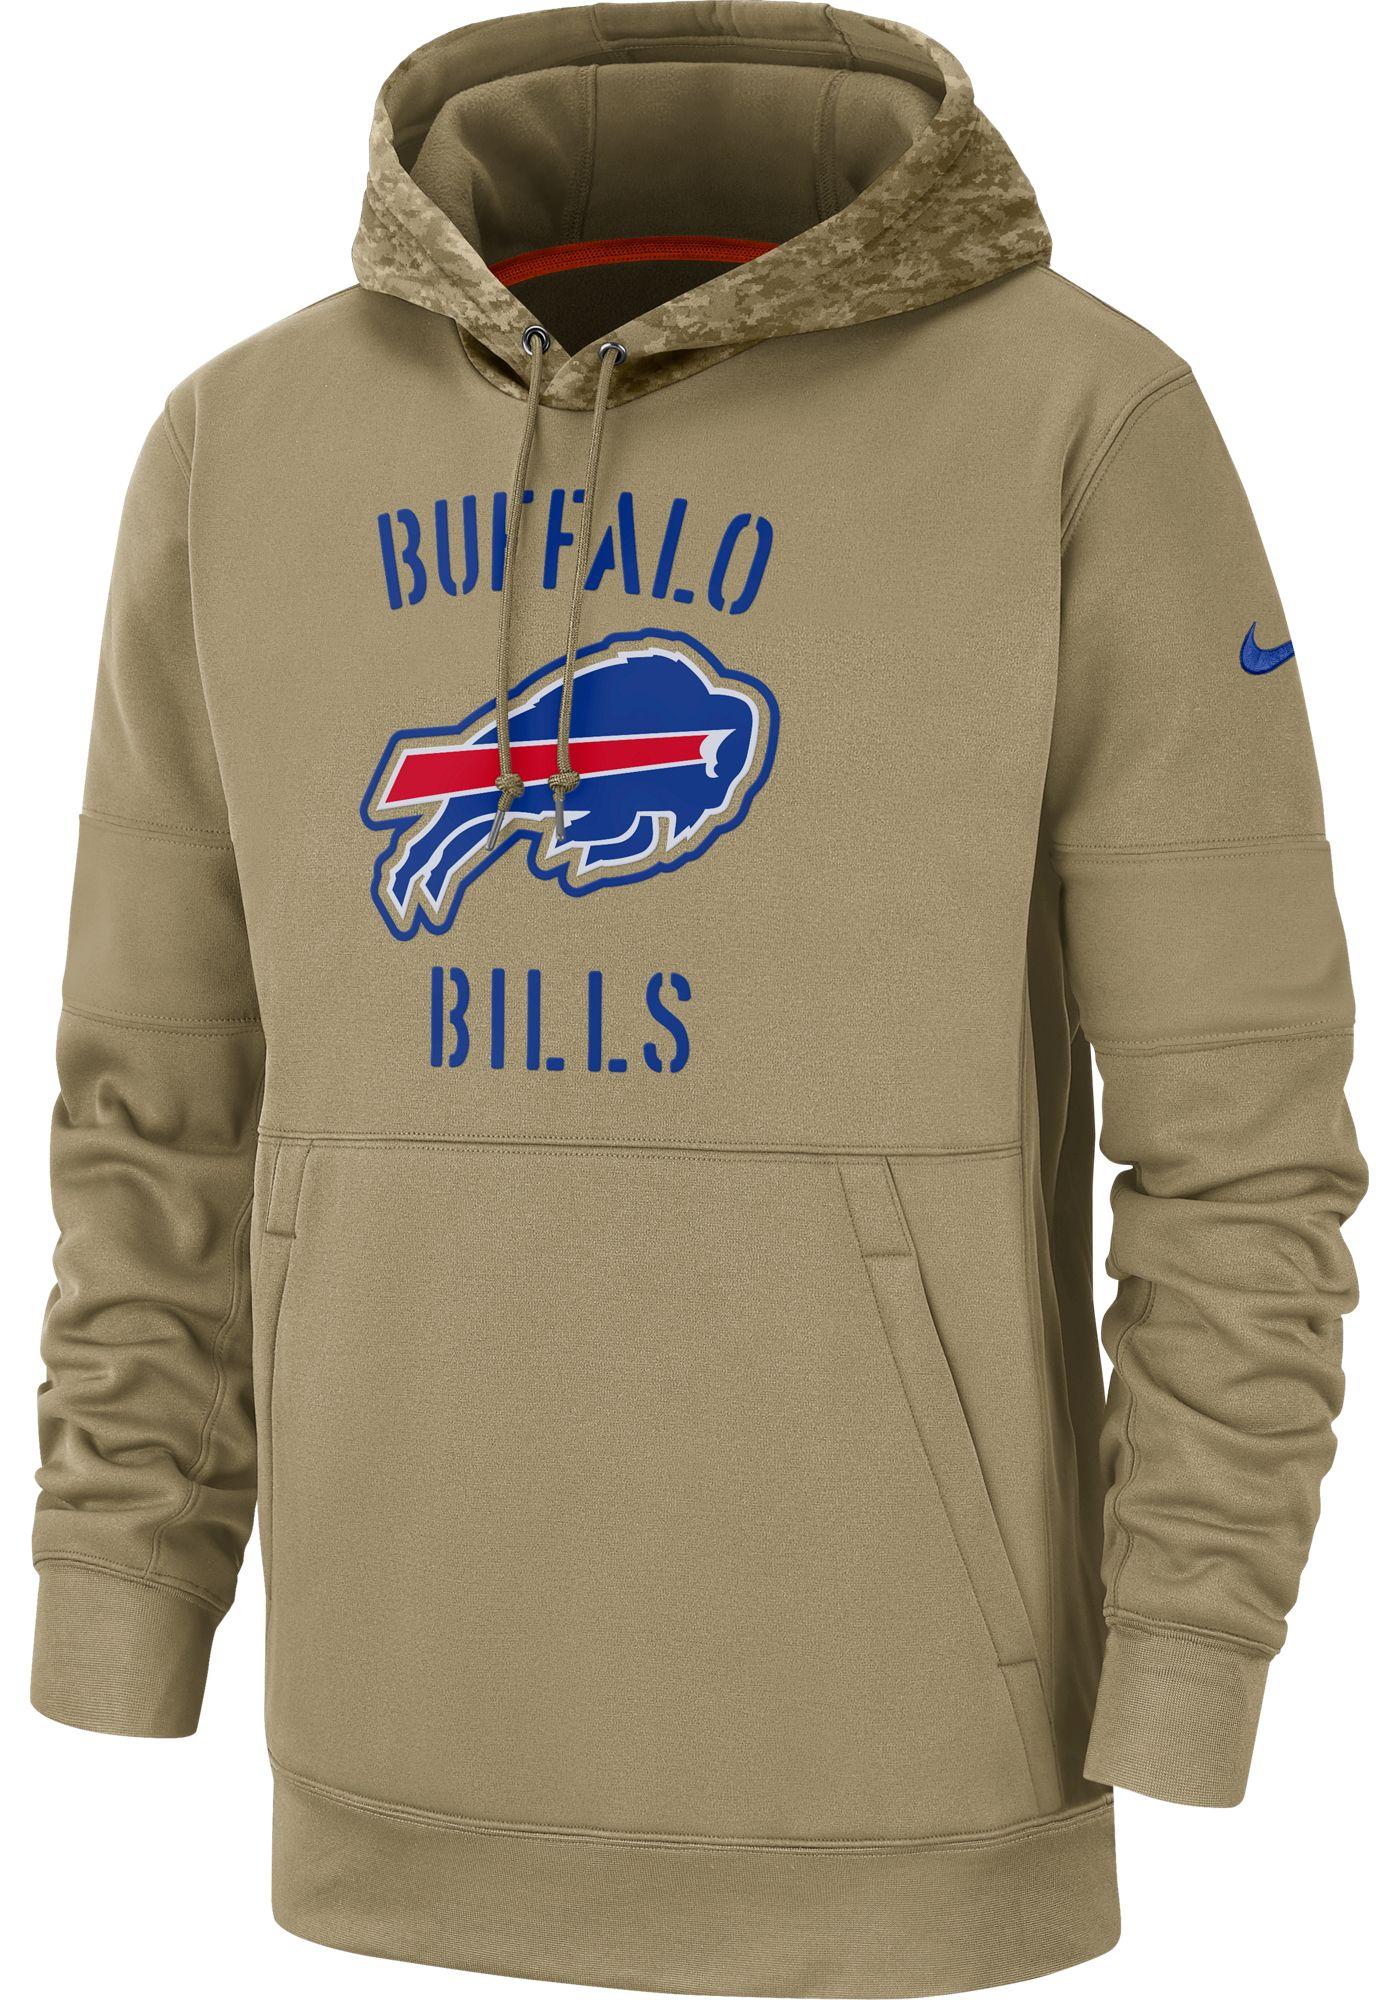 Nike Men's Salute to Service Buffalo Bills Therma-FIT Beige Camo Hoodie